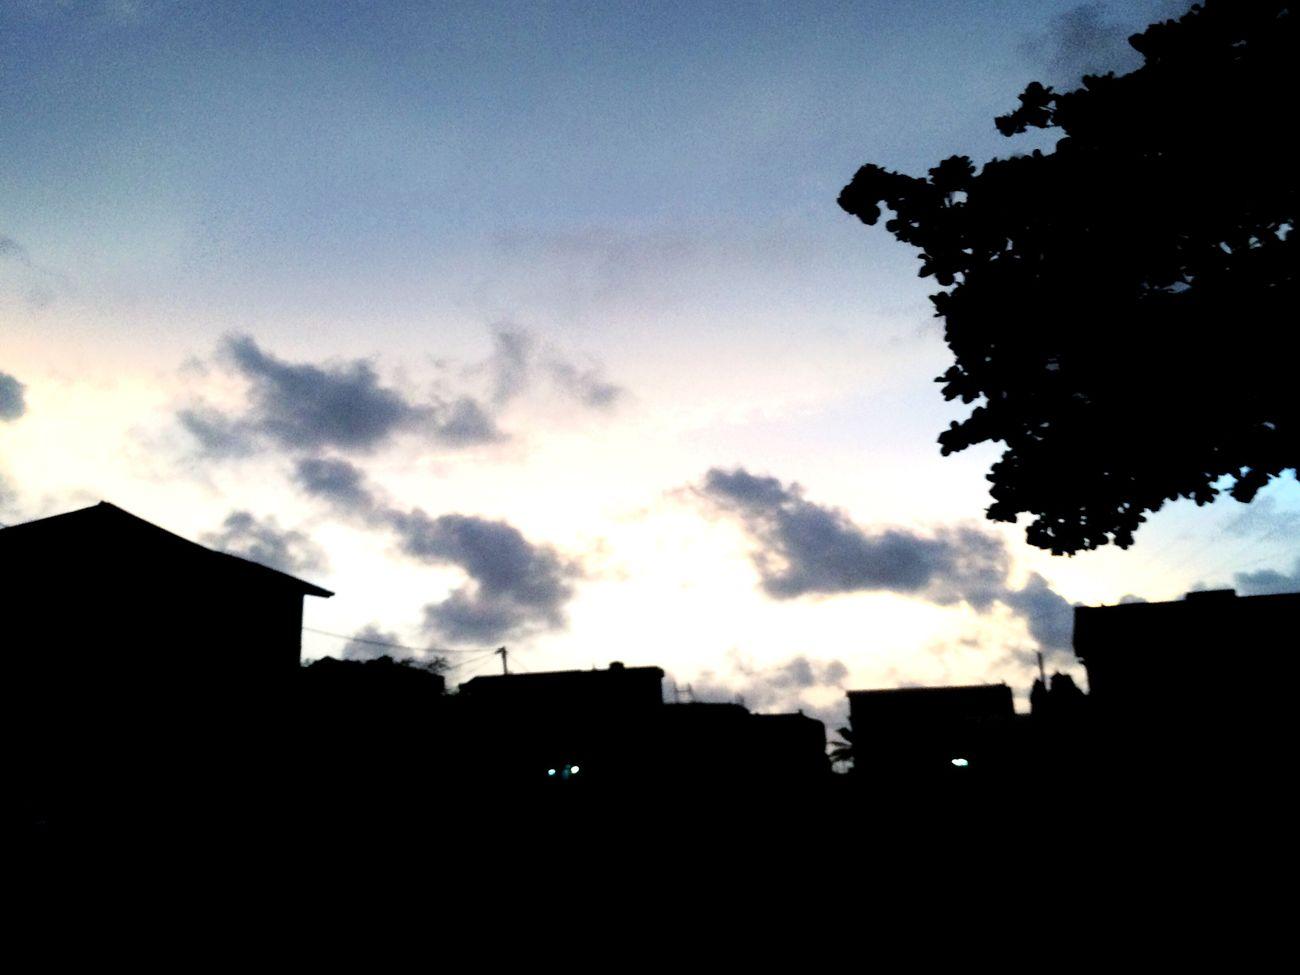 Its 19.00H in Cotonou, Benin Republic. Pulchritude cloud First Eyeem Photo